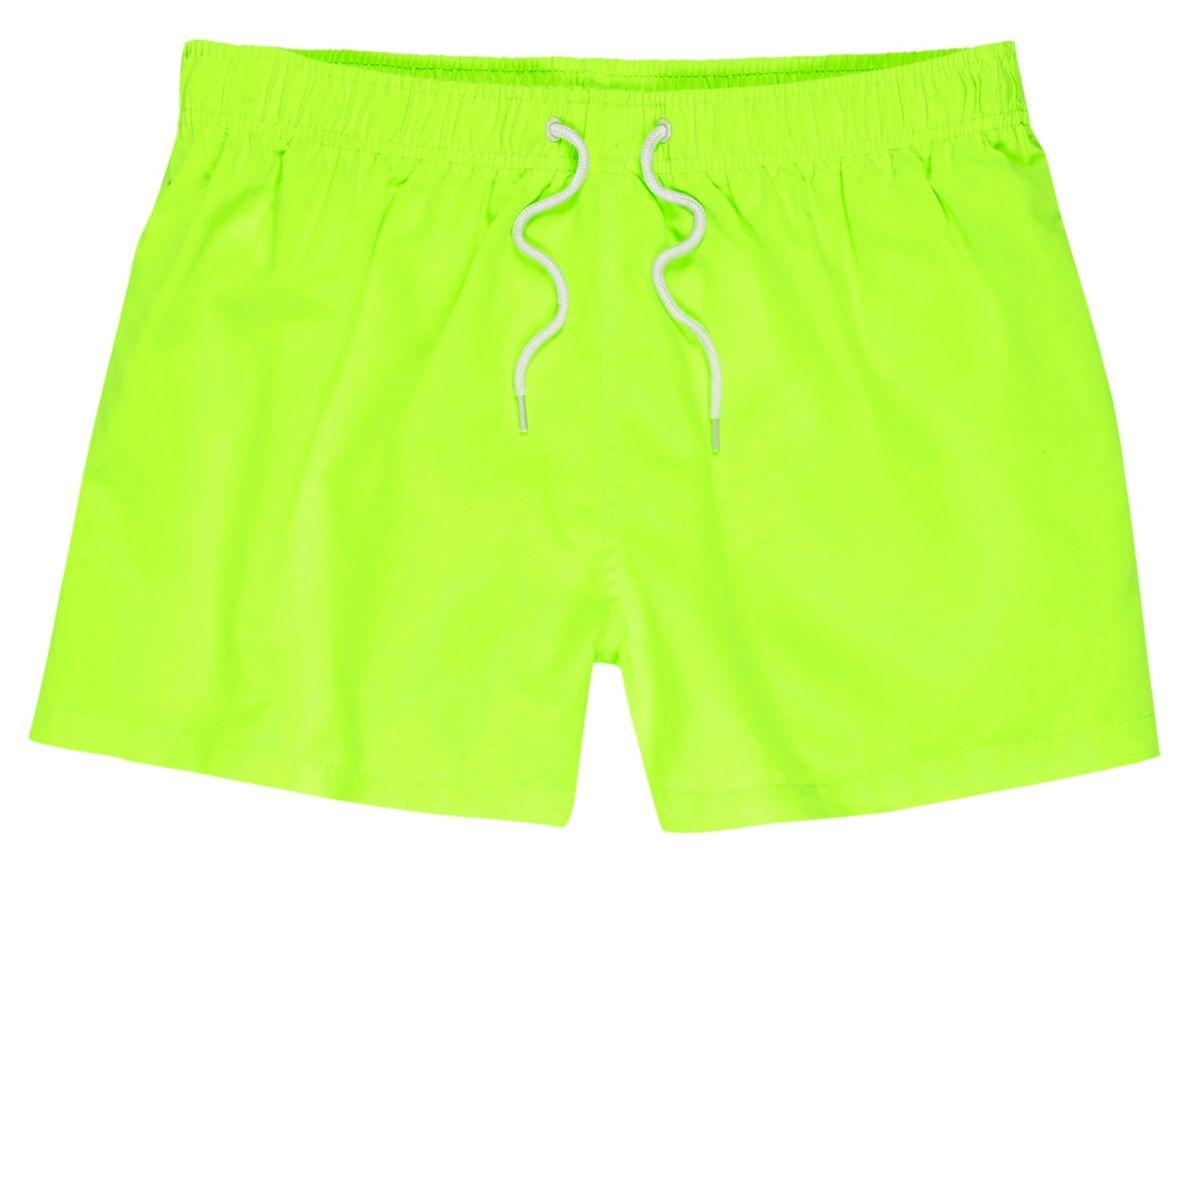 Green fluro swim trunks